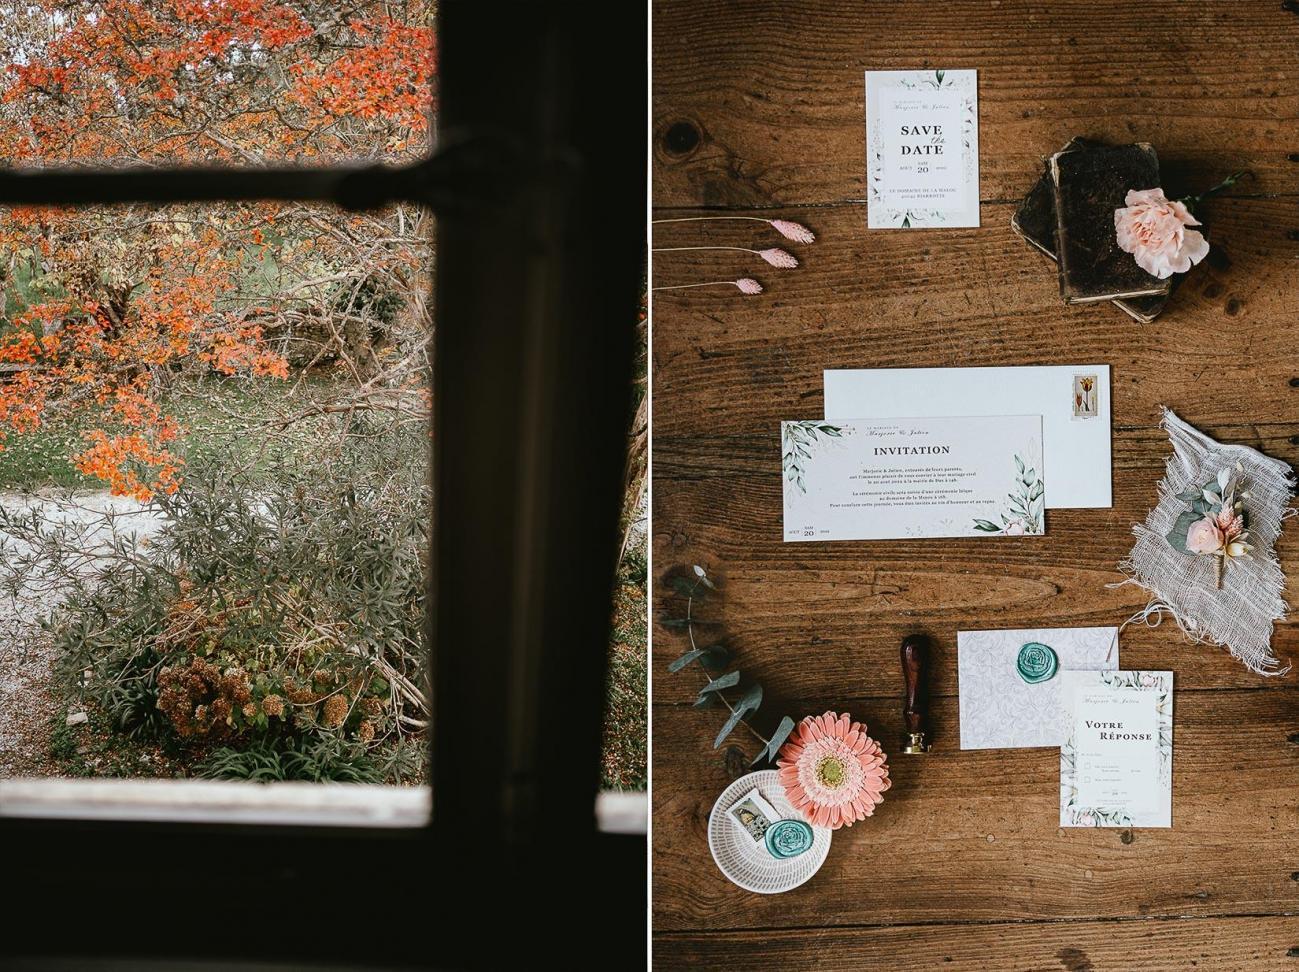 Mariage landes photographe inspiration elopement rustique wedding 54